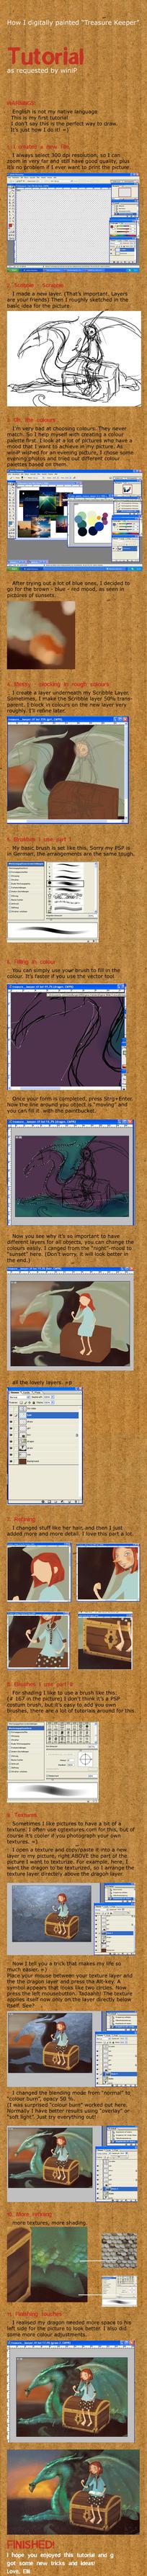 Treasure Keeper-a CG tutorial by Fuselwusel